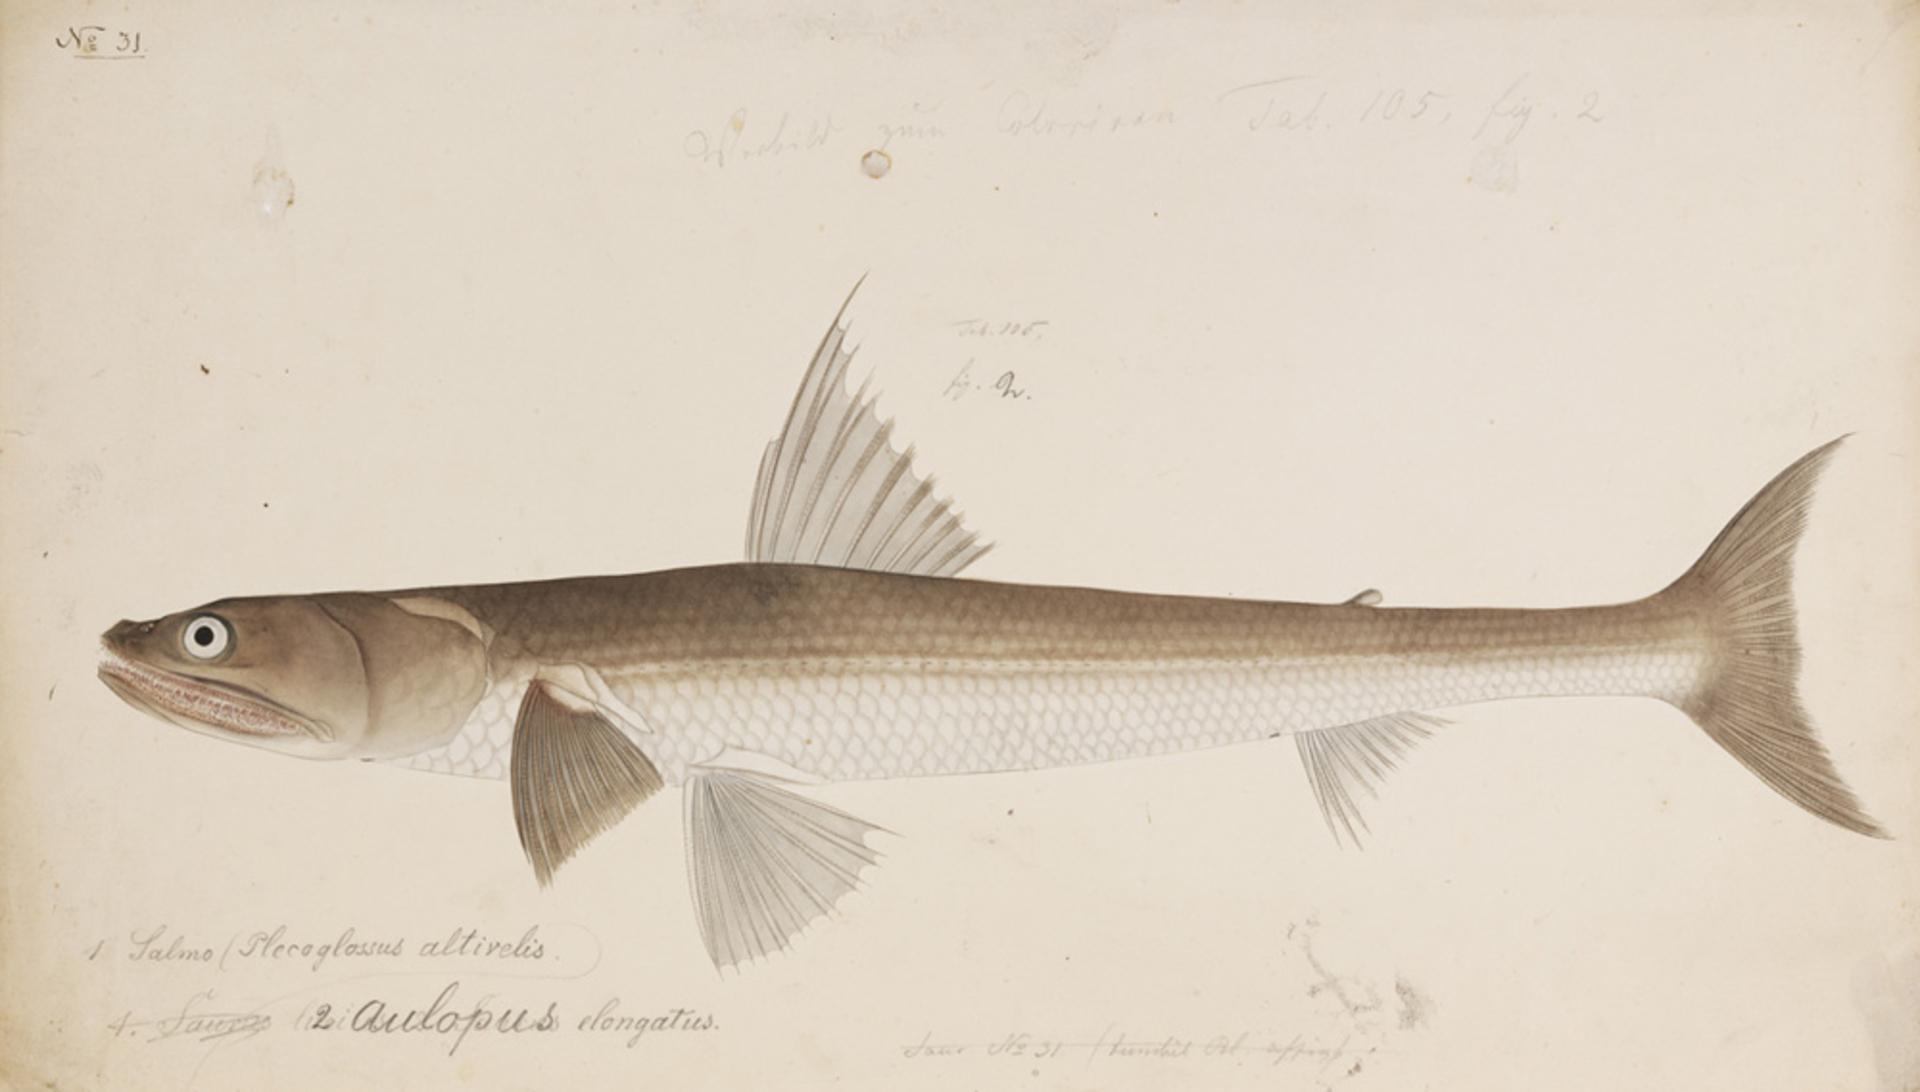 RMNH.ART.263 | Trachinocephalus myops